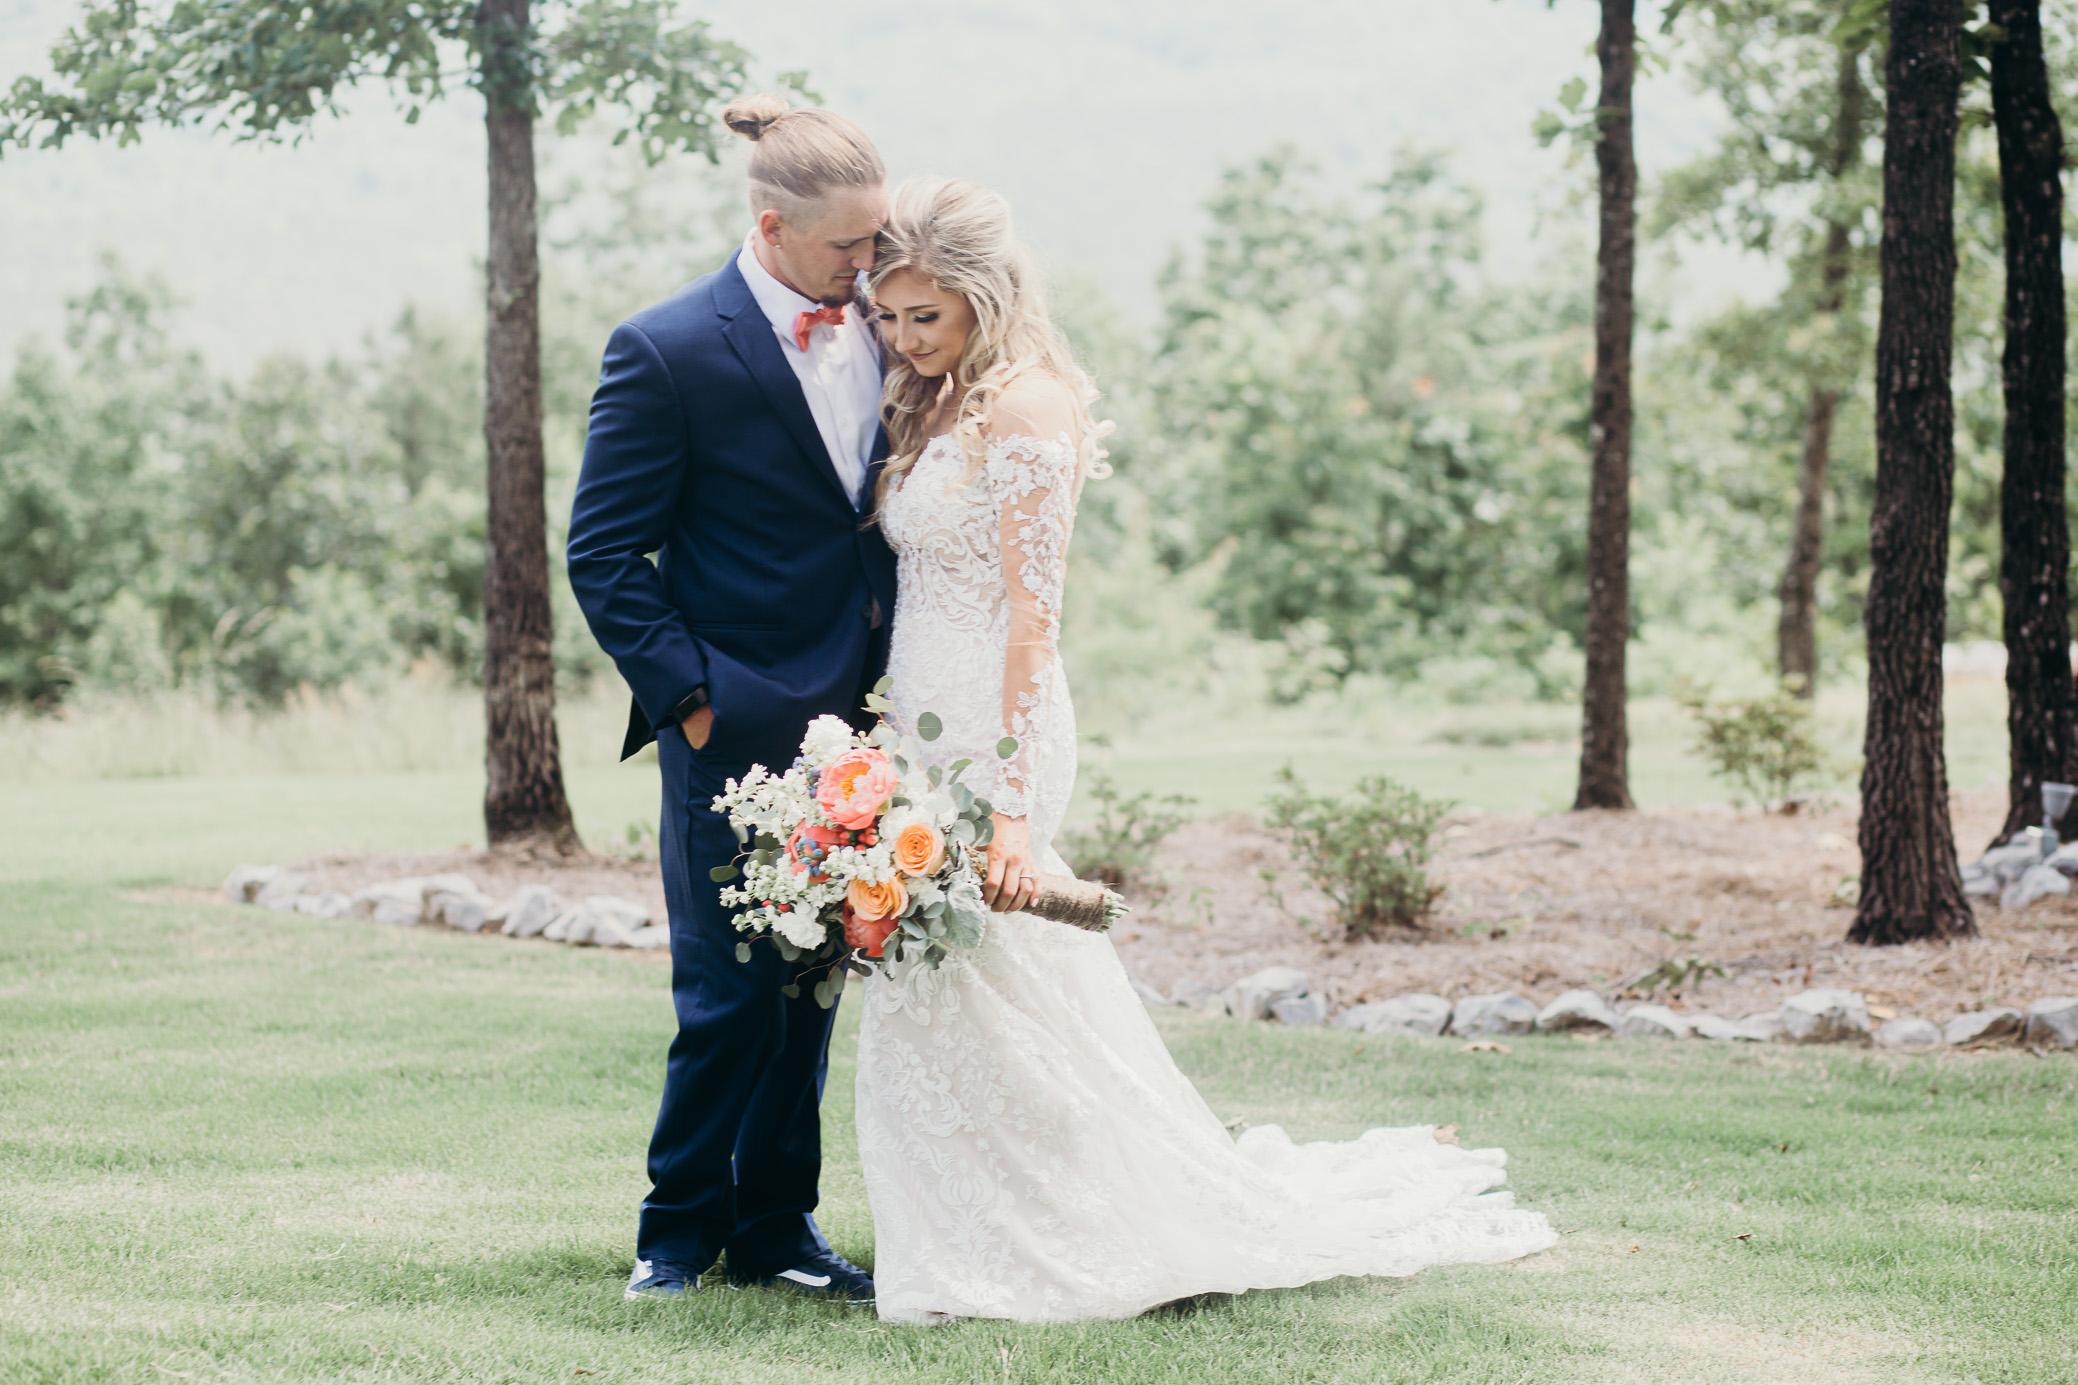 Denver Colorado wedding photography by David A. Smith of DSmithImages Wedding Photography, Portraits, and Events, a wedding photographer in Birmingham, Alabama